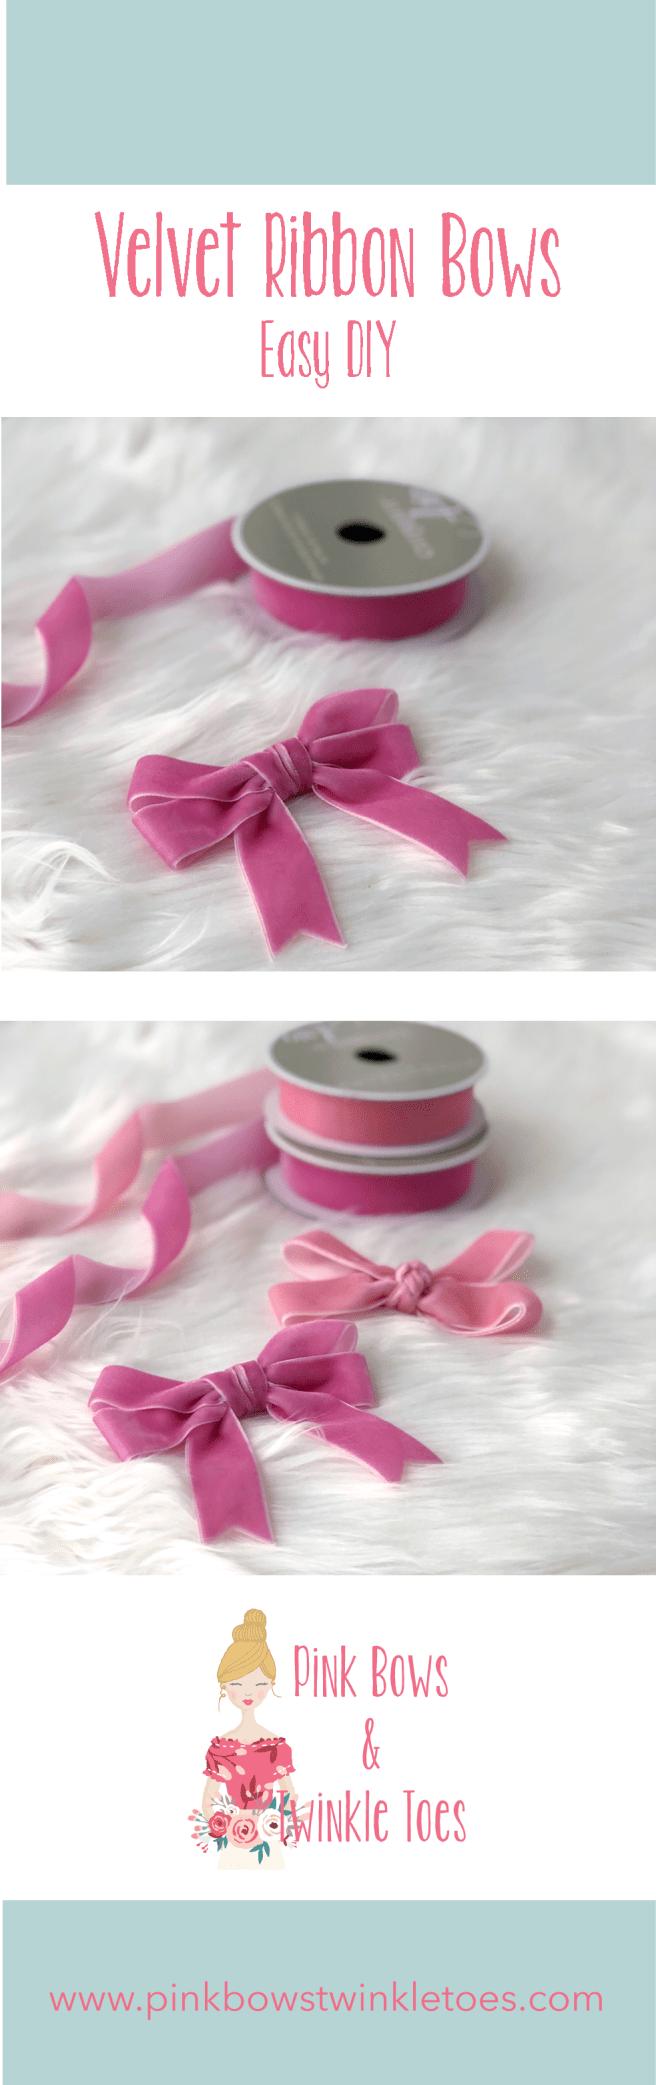 Easy DIY: Velvet Ribbon Bows Part 3 #howtomakeabowwithribbon